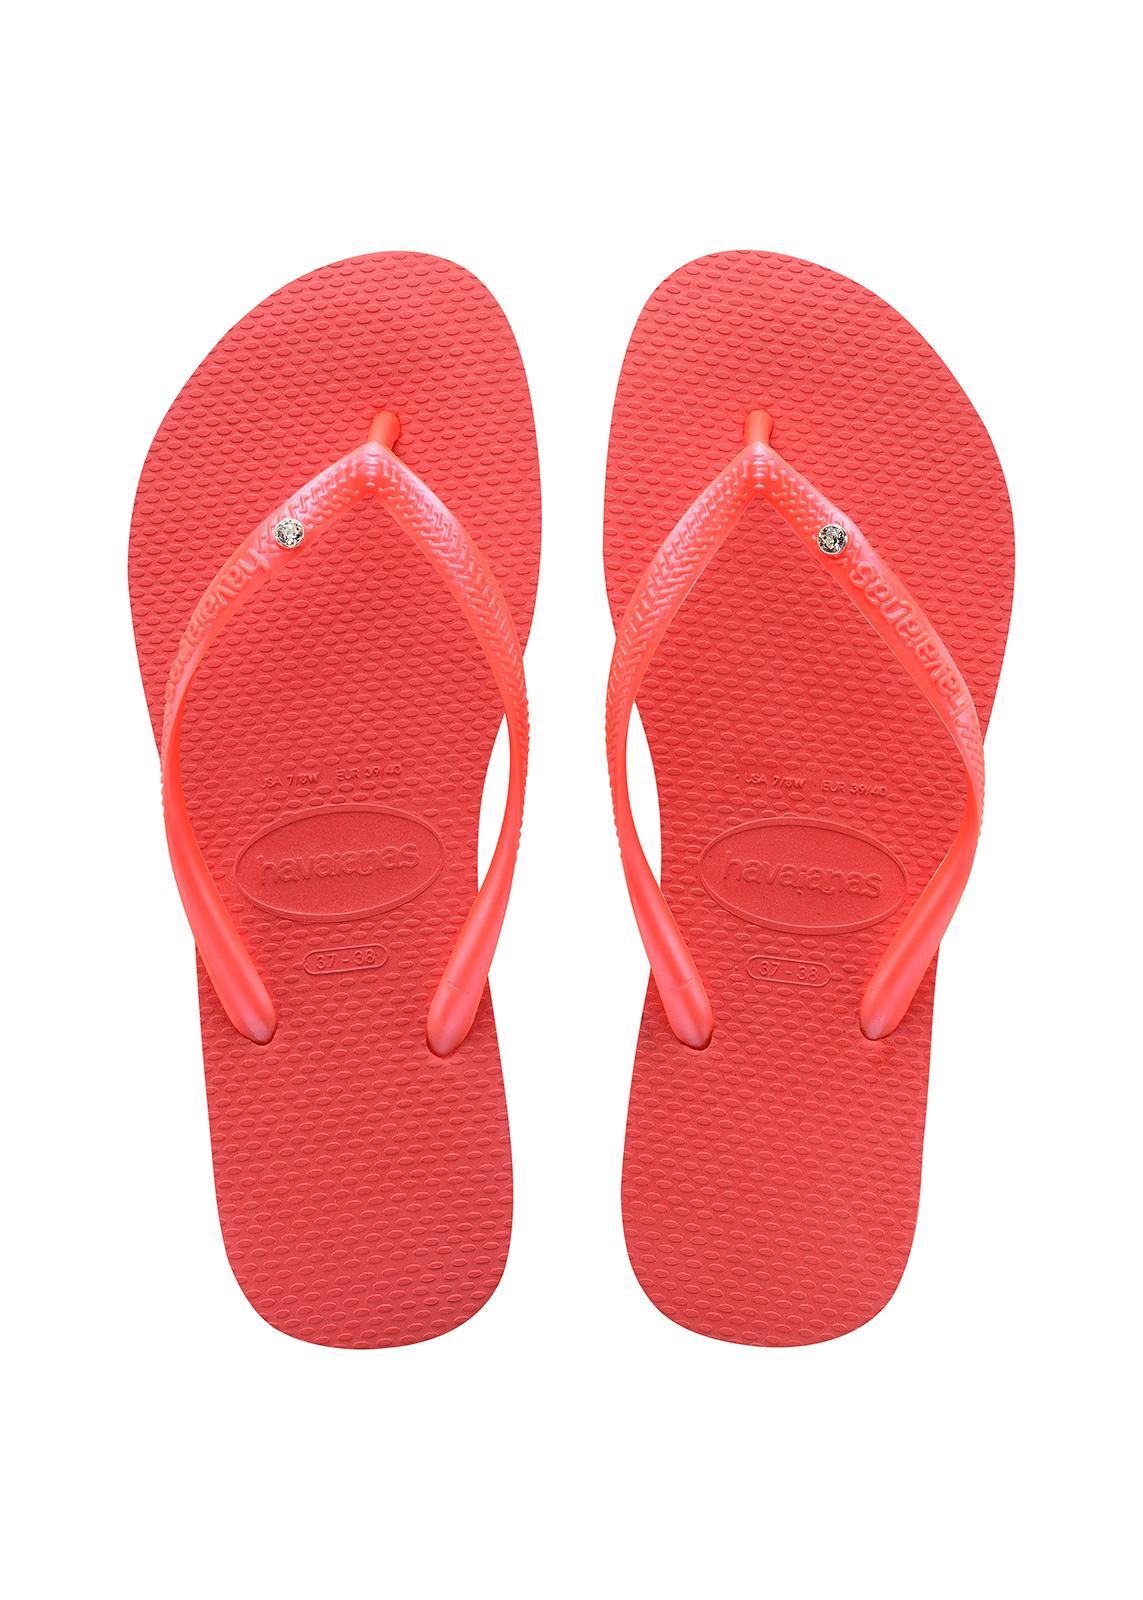 f76b0f46d Flip-Flops Red Flip Flops - Havaianas Slim Crystal Sw Coralnew